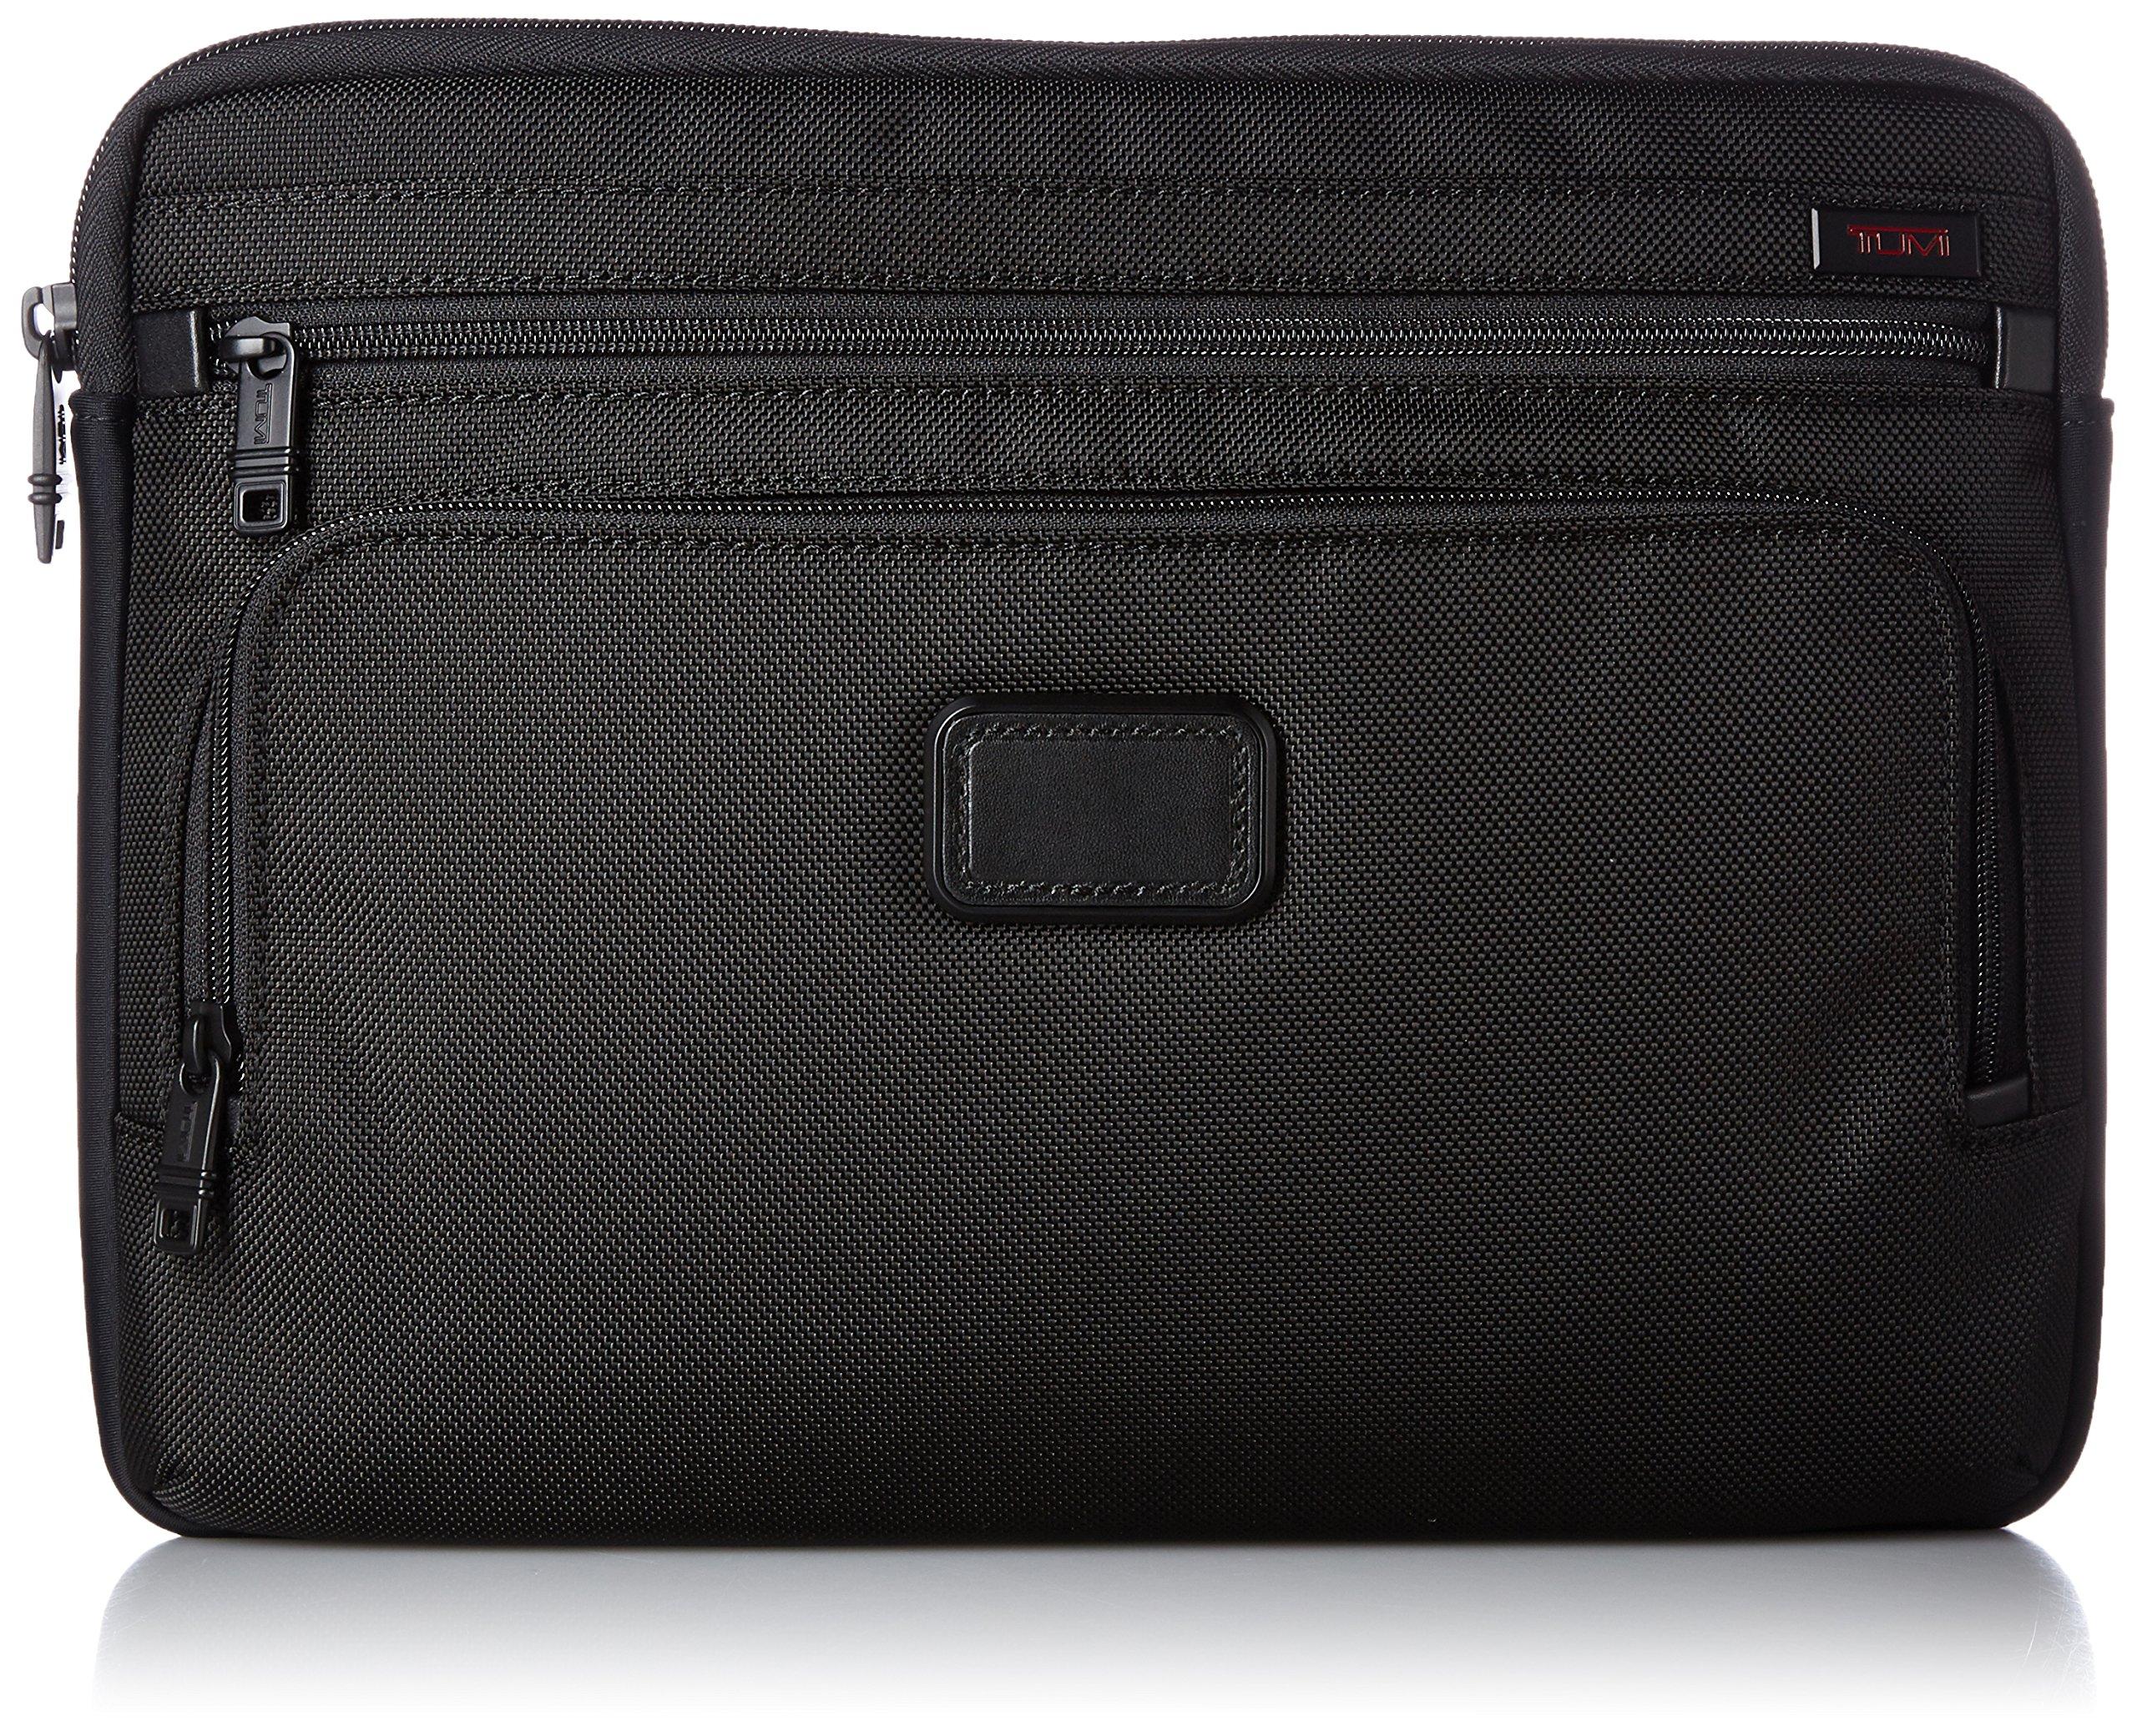 Tumi Alpha Large Laptop Cover, Black, One Size